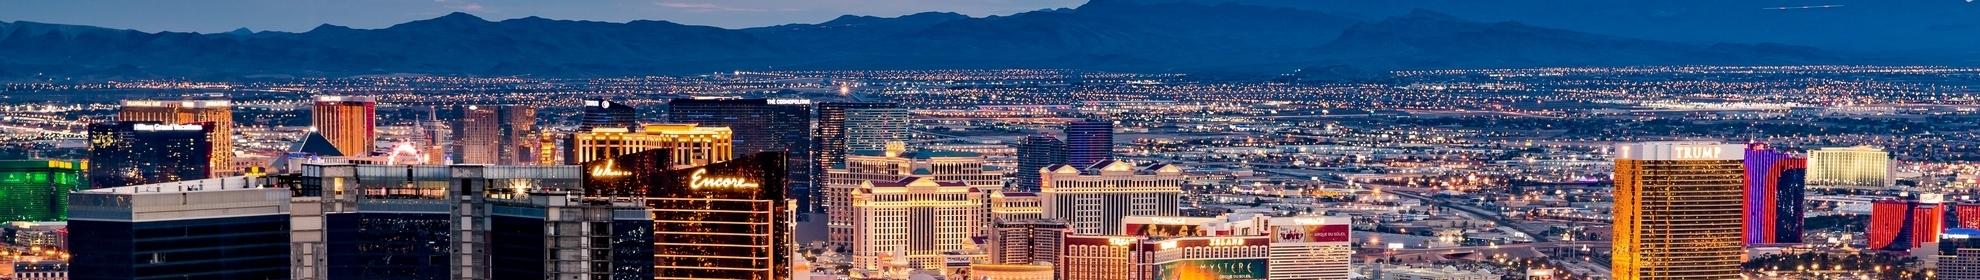 Jet Luxury Resorts The Signature Condo Hotel Las Vegas Nv